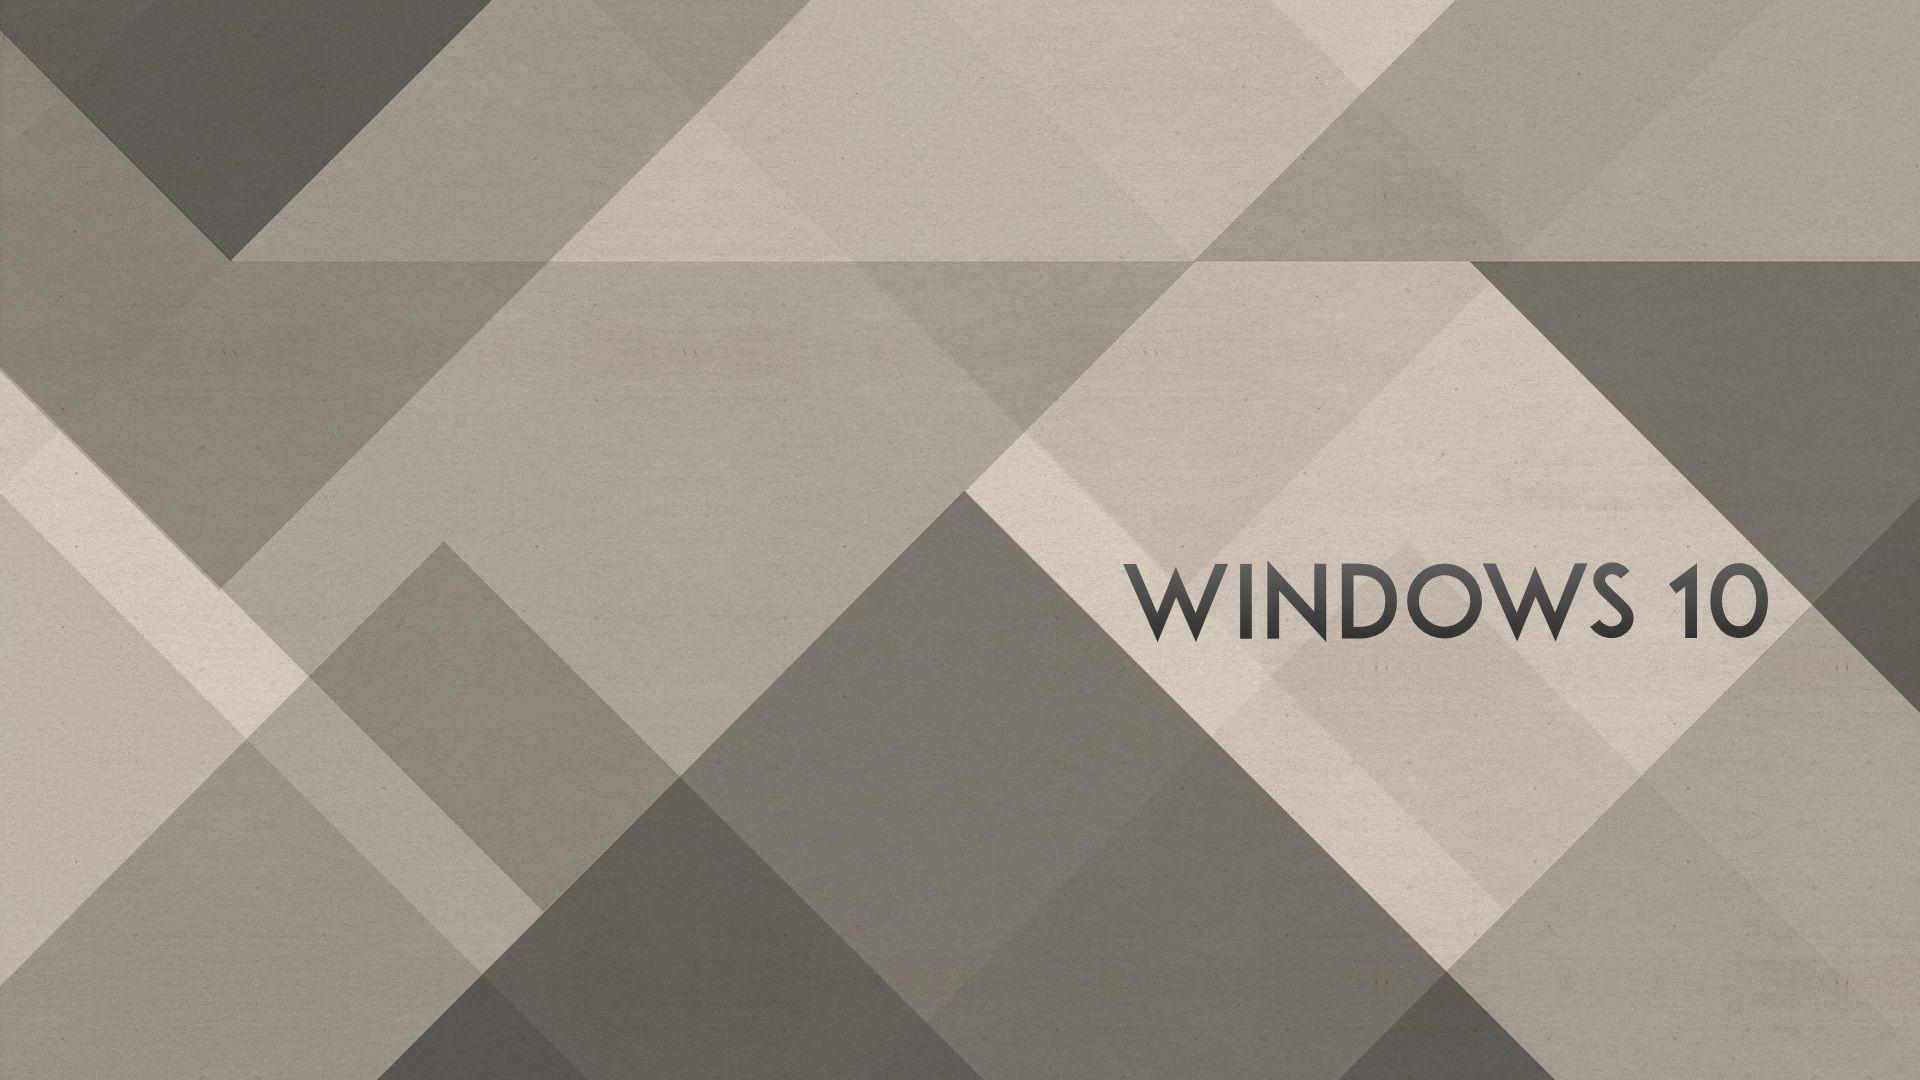 Windows 10 Wallpaper 1080p Full HD Grey Abstract – HD-Desktop